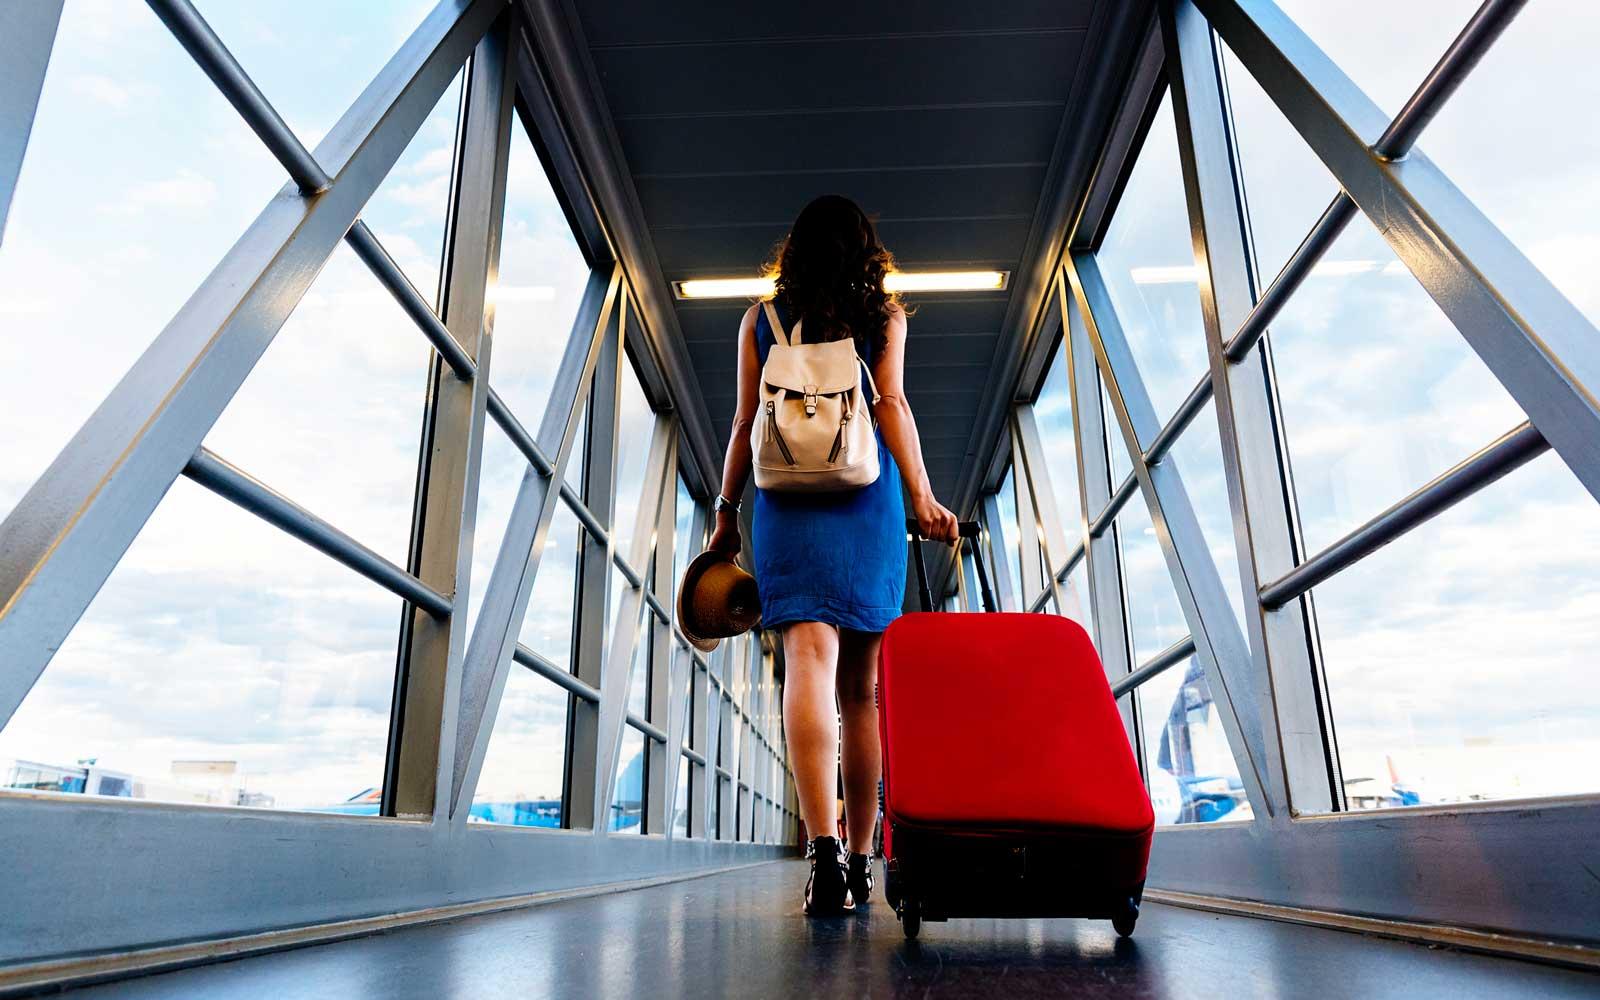 boarding-airplane-KNOBEFOR0119.jpg